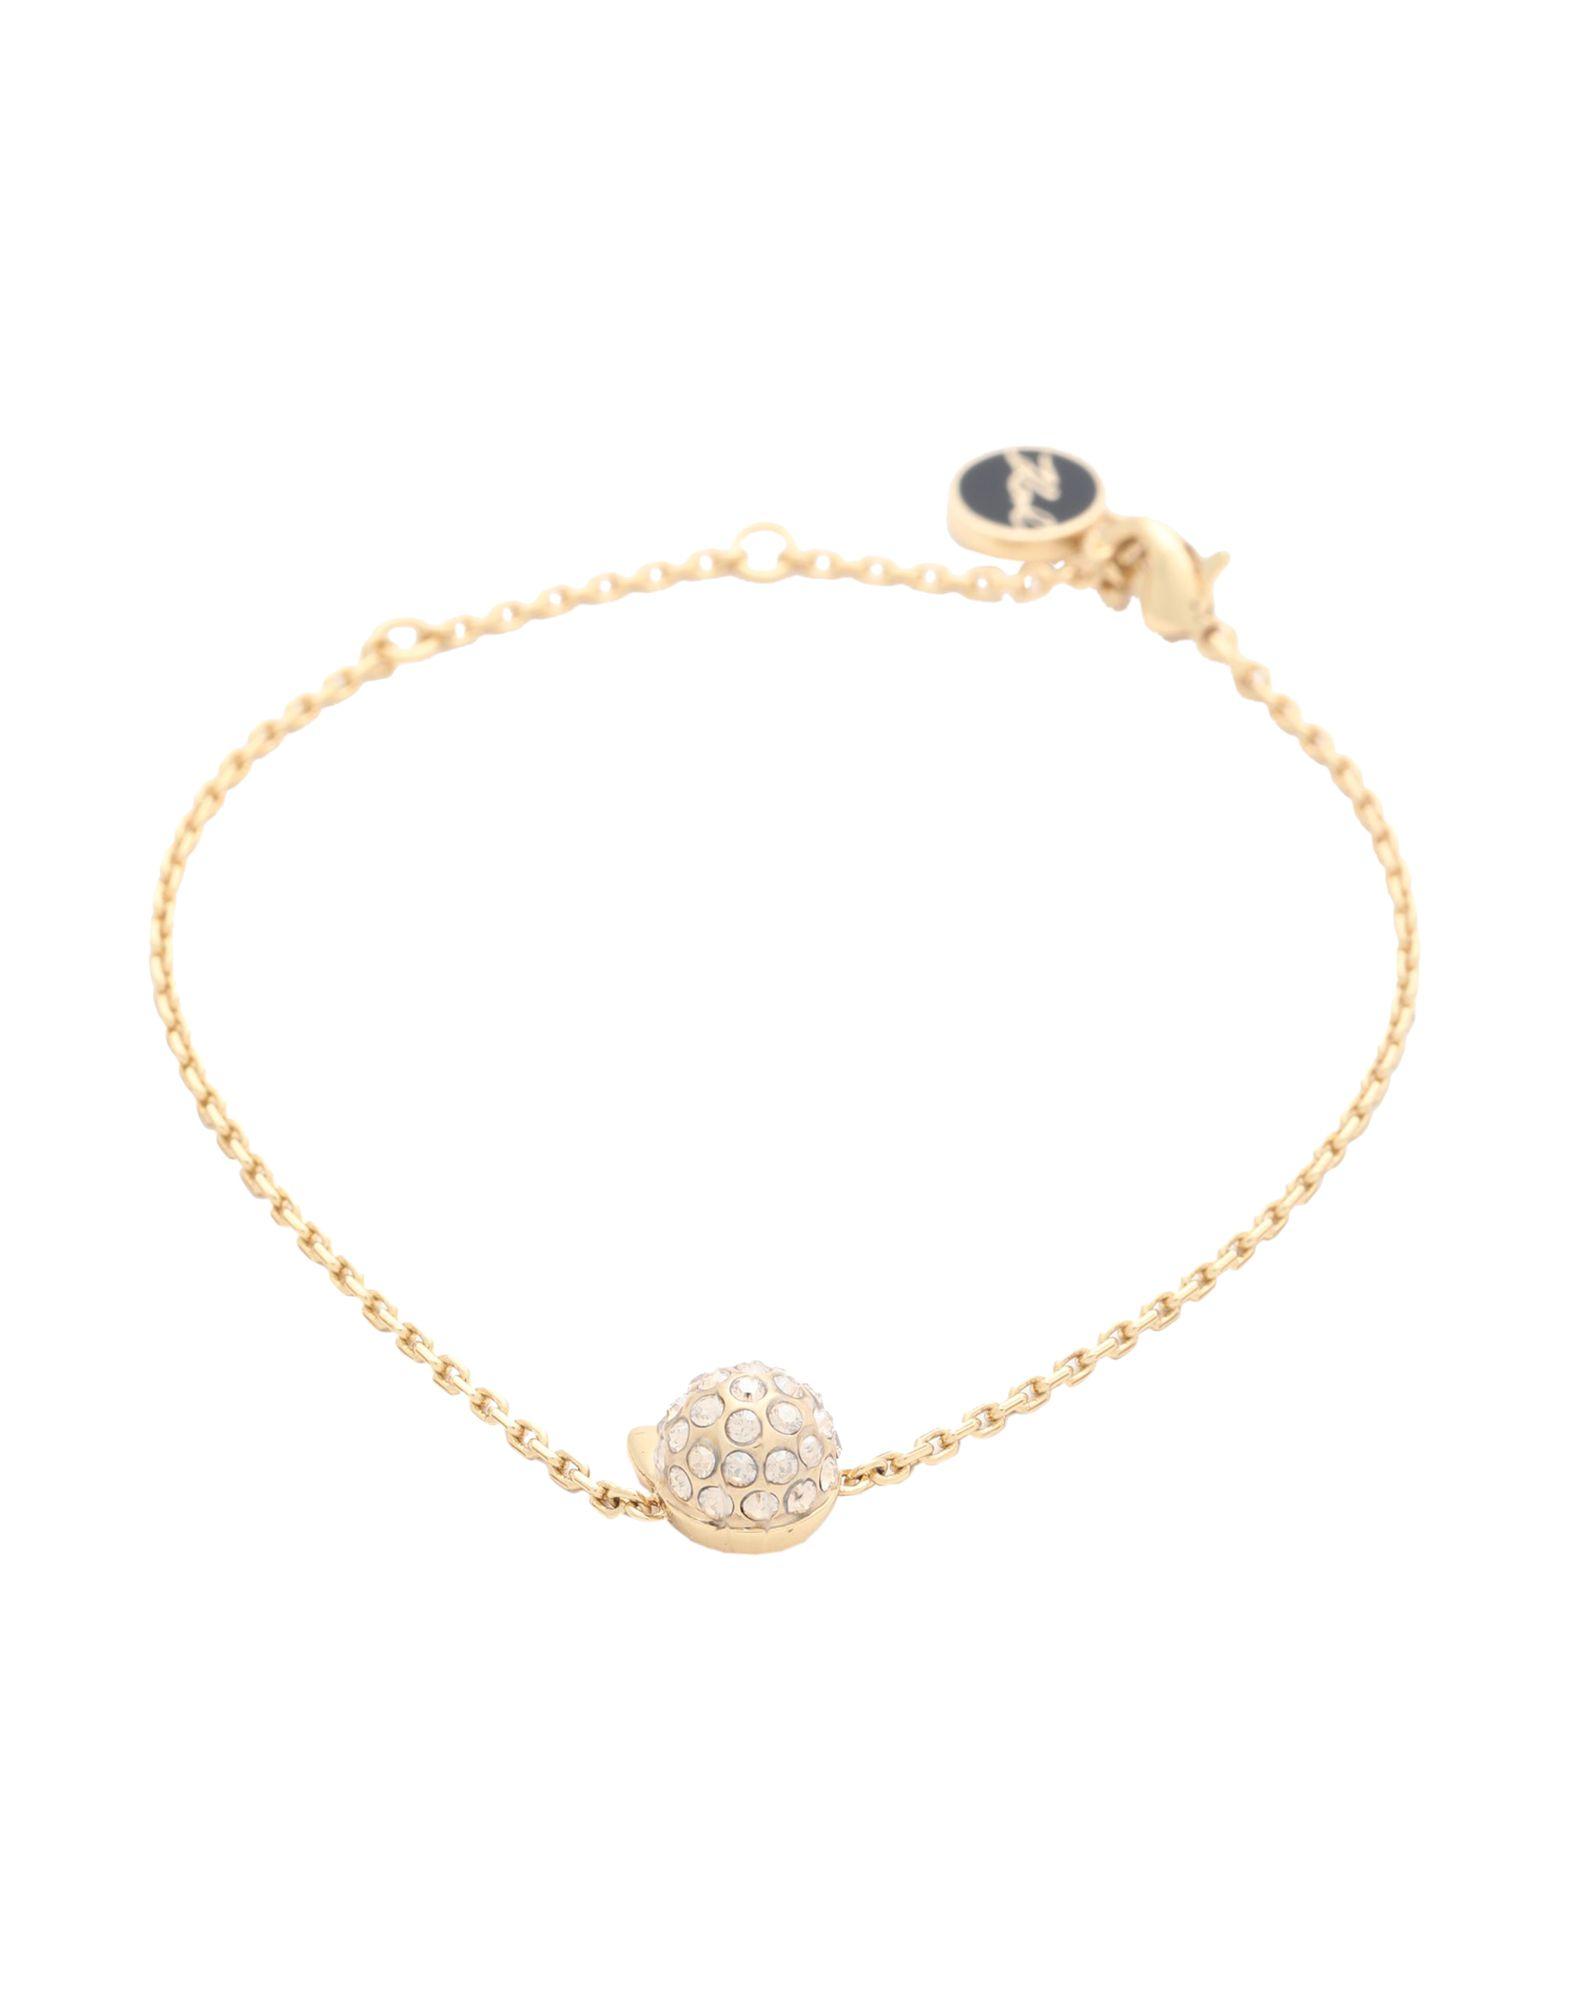 KARL LAGERFELD Bracelets - Item 50243653